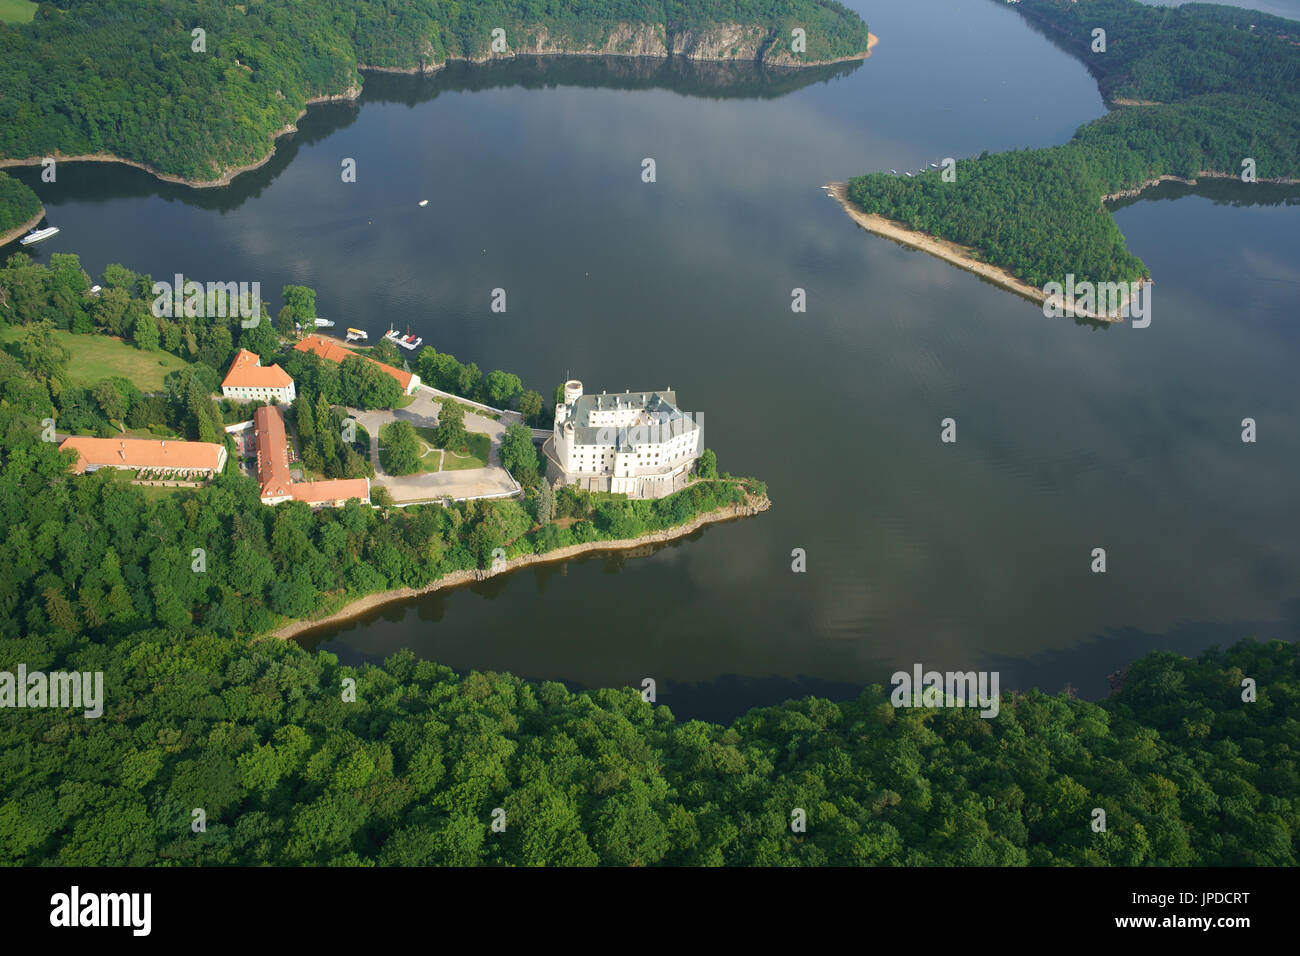 CASTLE IN THE VLTAVA VALLEY, AT LAKE ORLIK (aerial view). Orlik Castle, Bohemia, Czech Republic. - Stock Image